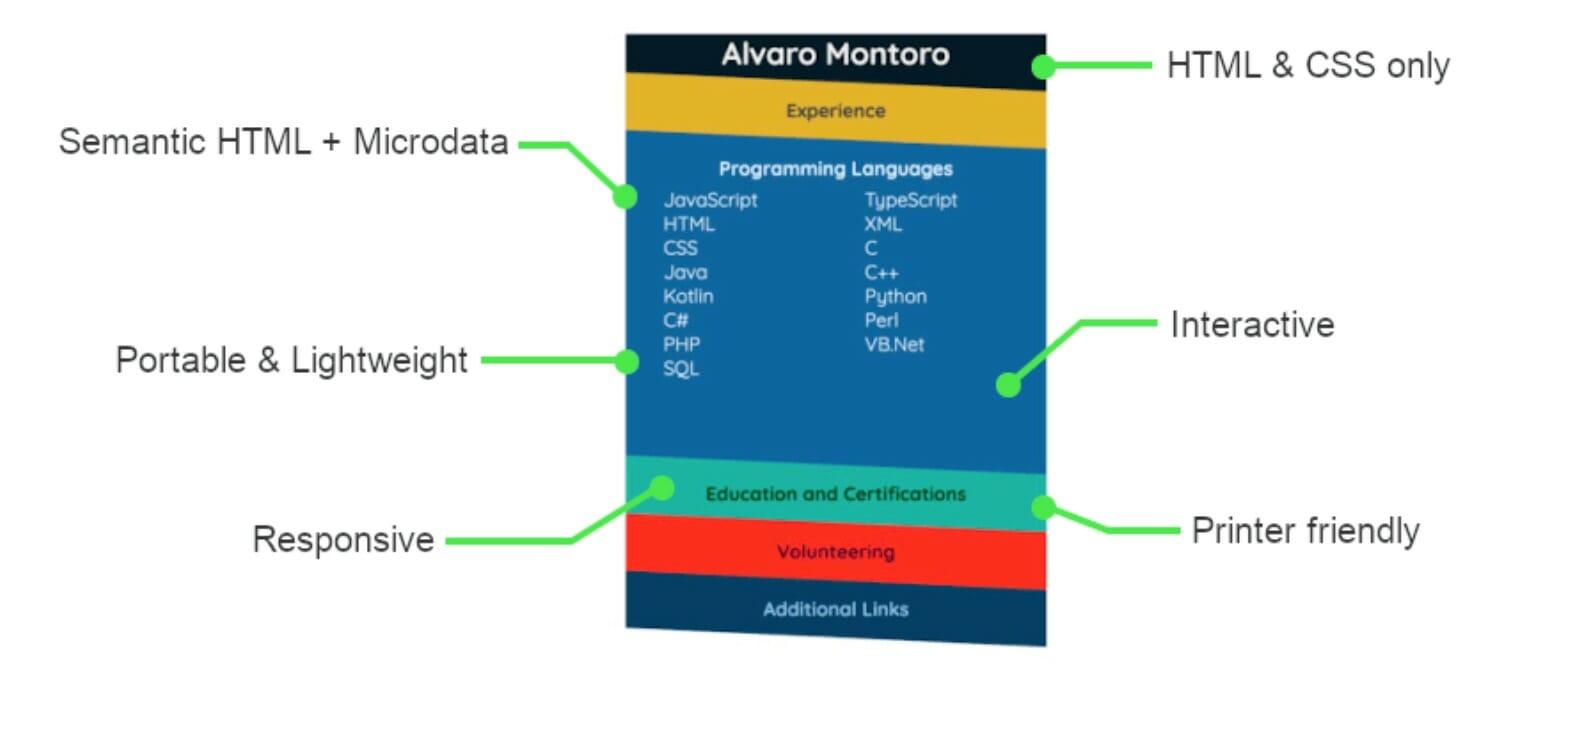 Alvaro Montaro interactive resume page